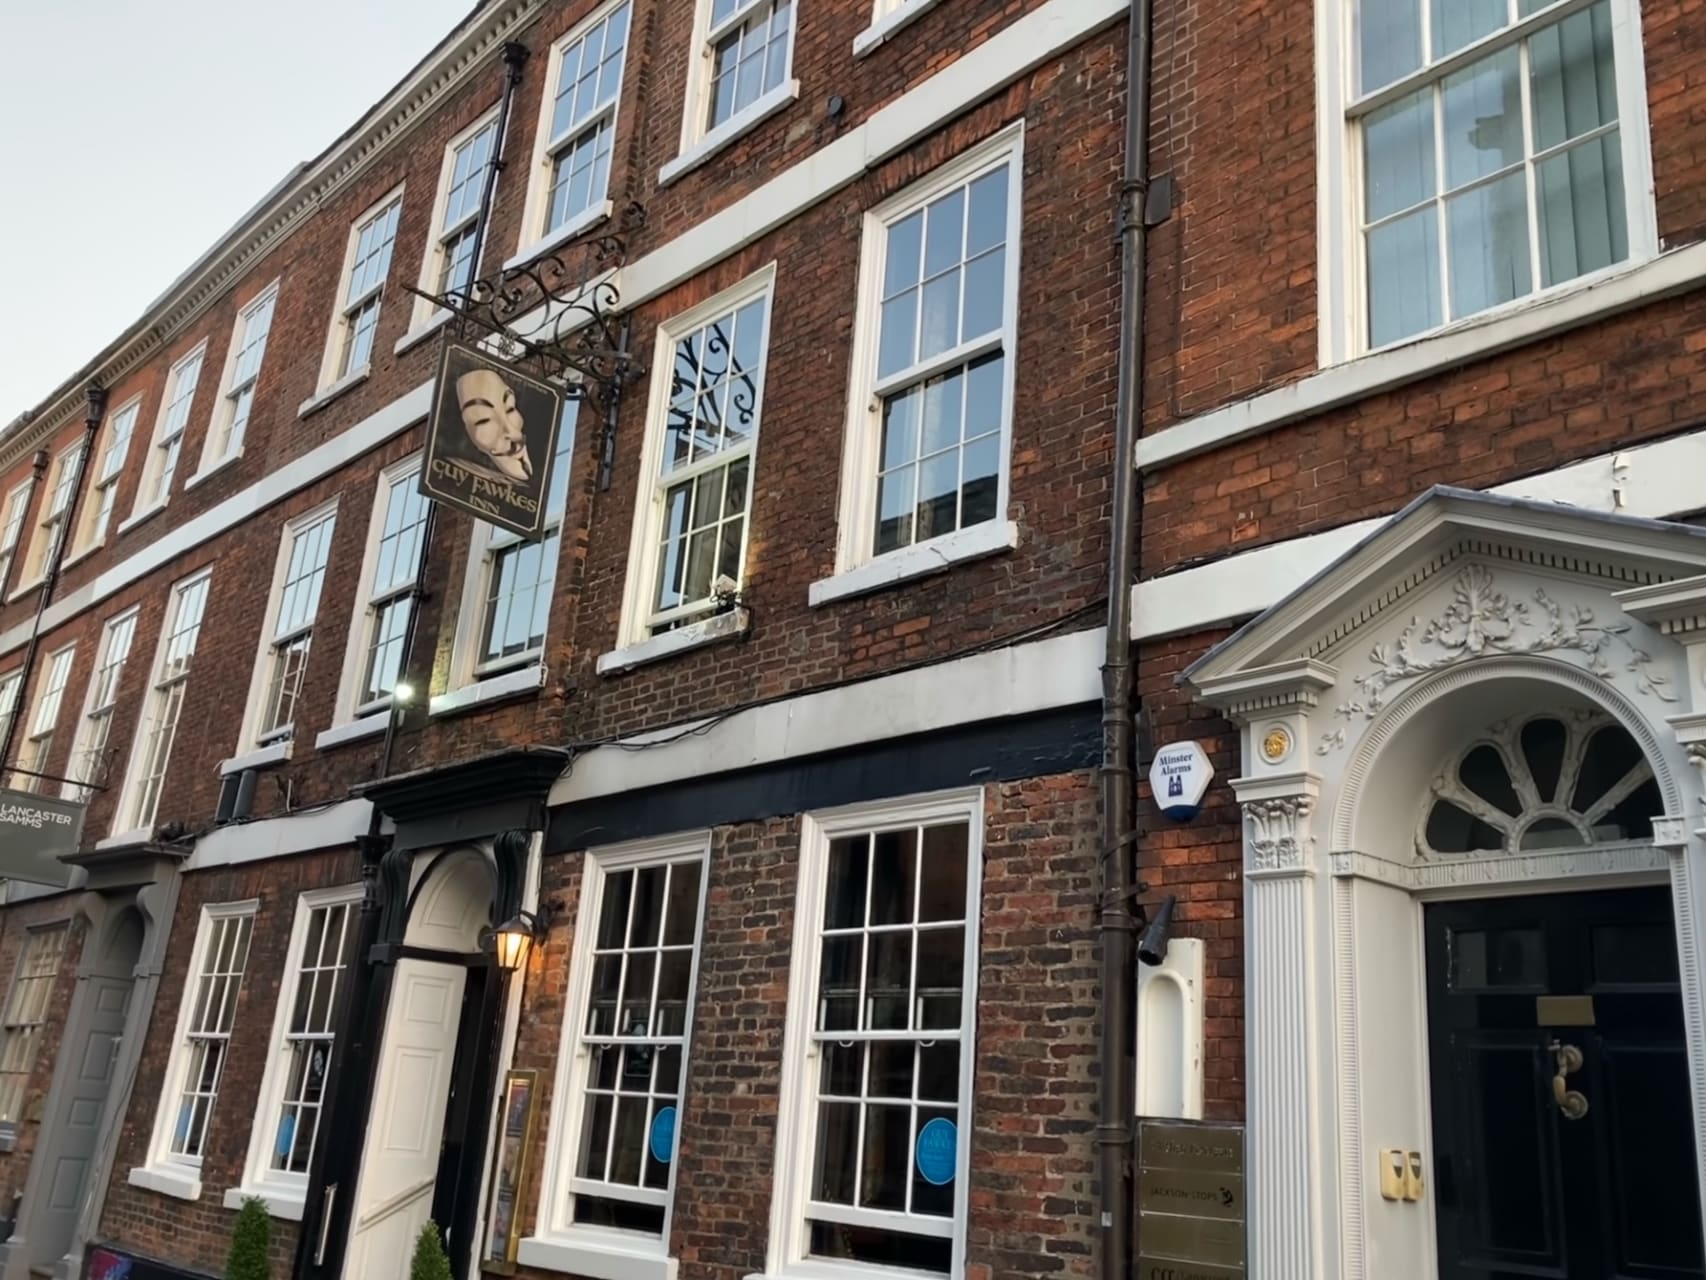 York - Guy Fawkes - Gunpowder, Treason and Plot in York